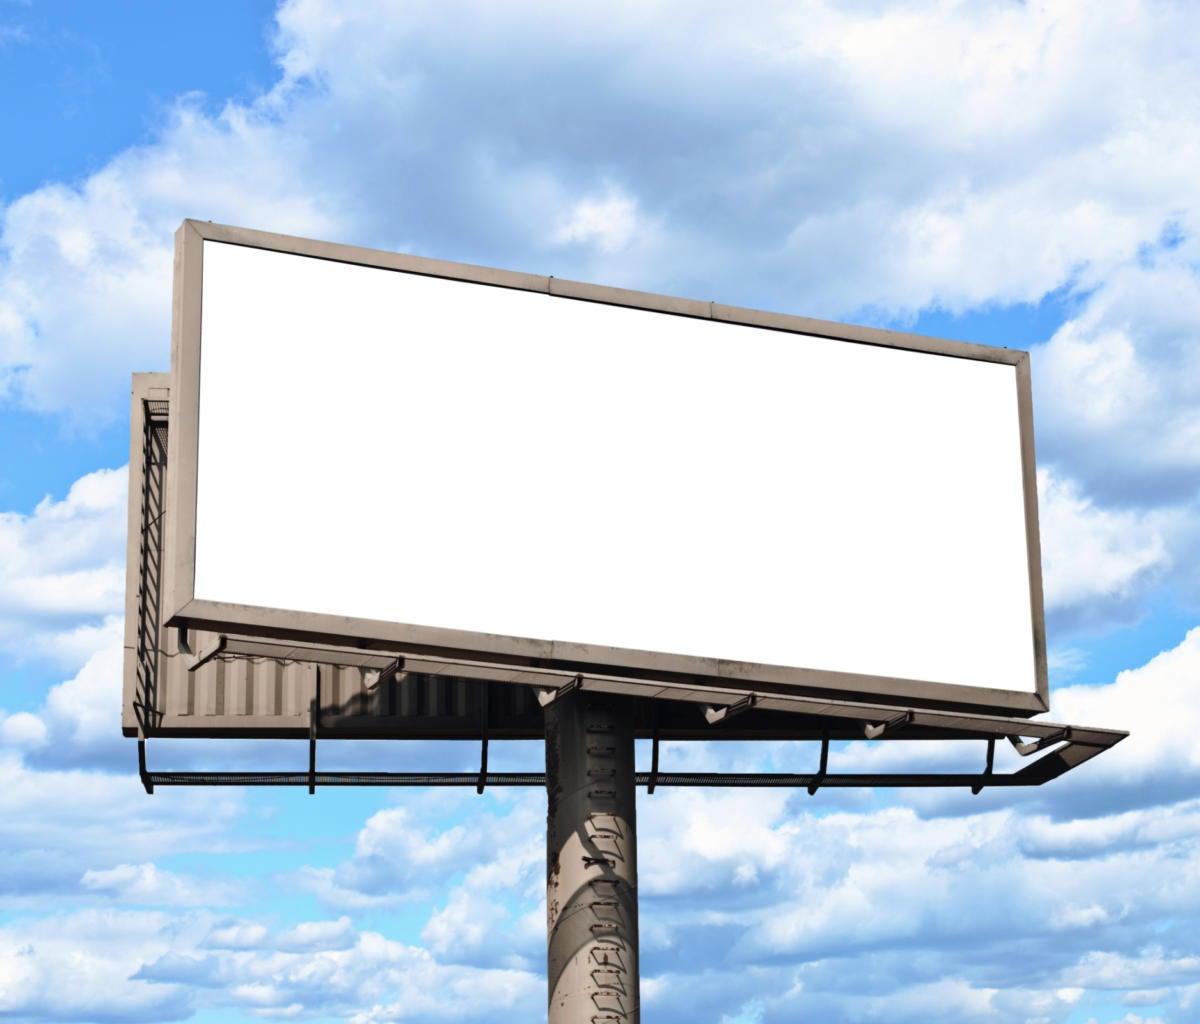 Forbes malware advertisements ad blocker Adblock Plus